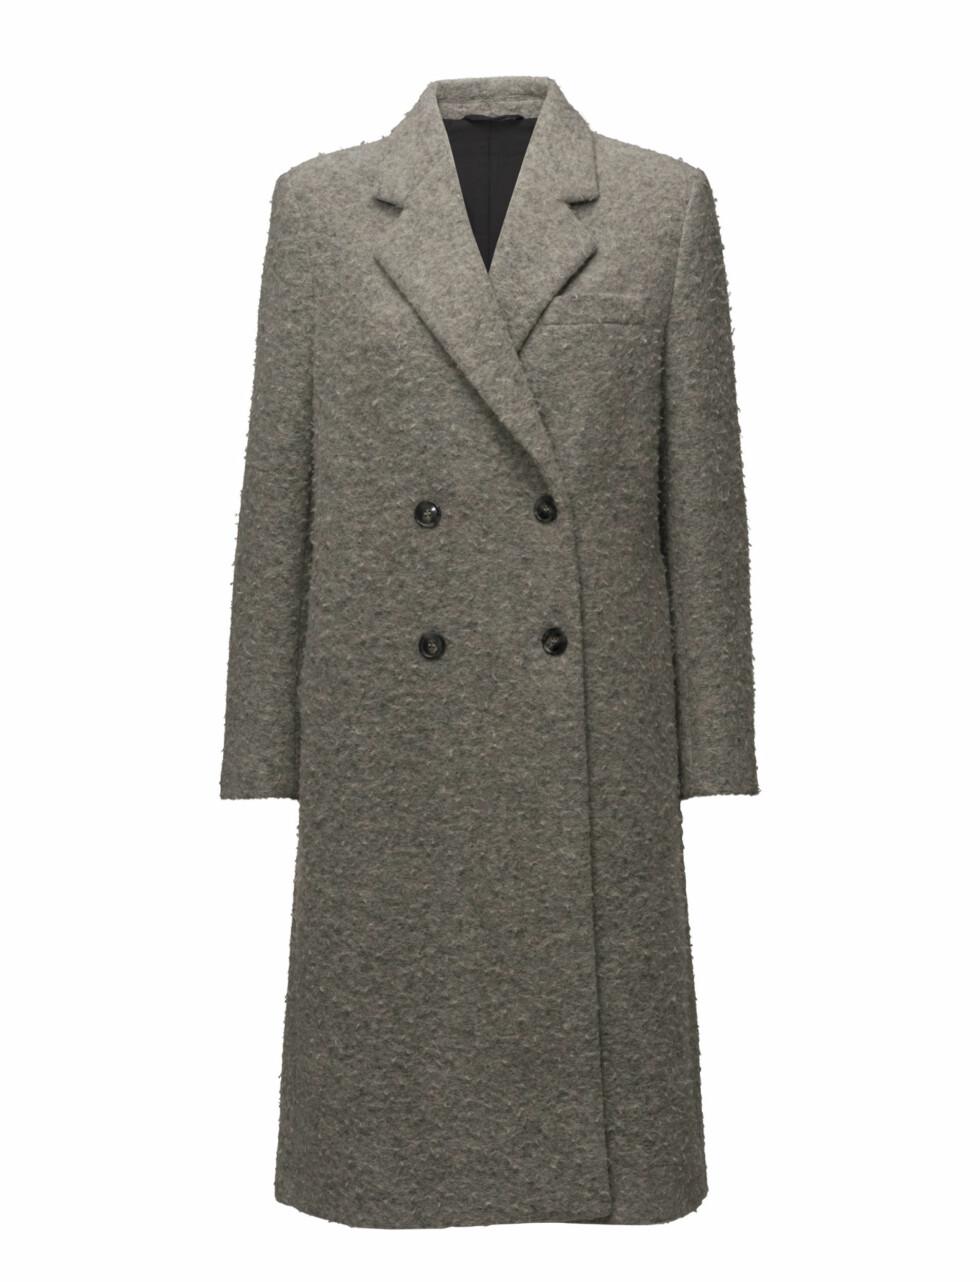 Kåpe fra Filippa K via Boozt.com  4600,-  https://www.boozt.com/no/no/filippa-k/edine-shaggy-tailored-coat_15682643/15682647?navId=67432&group=listing&position=1000000